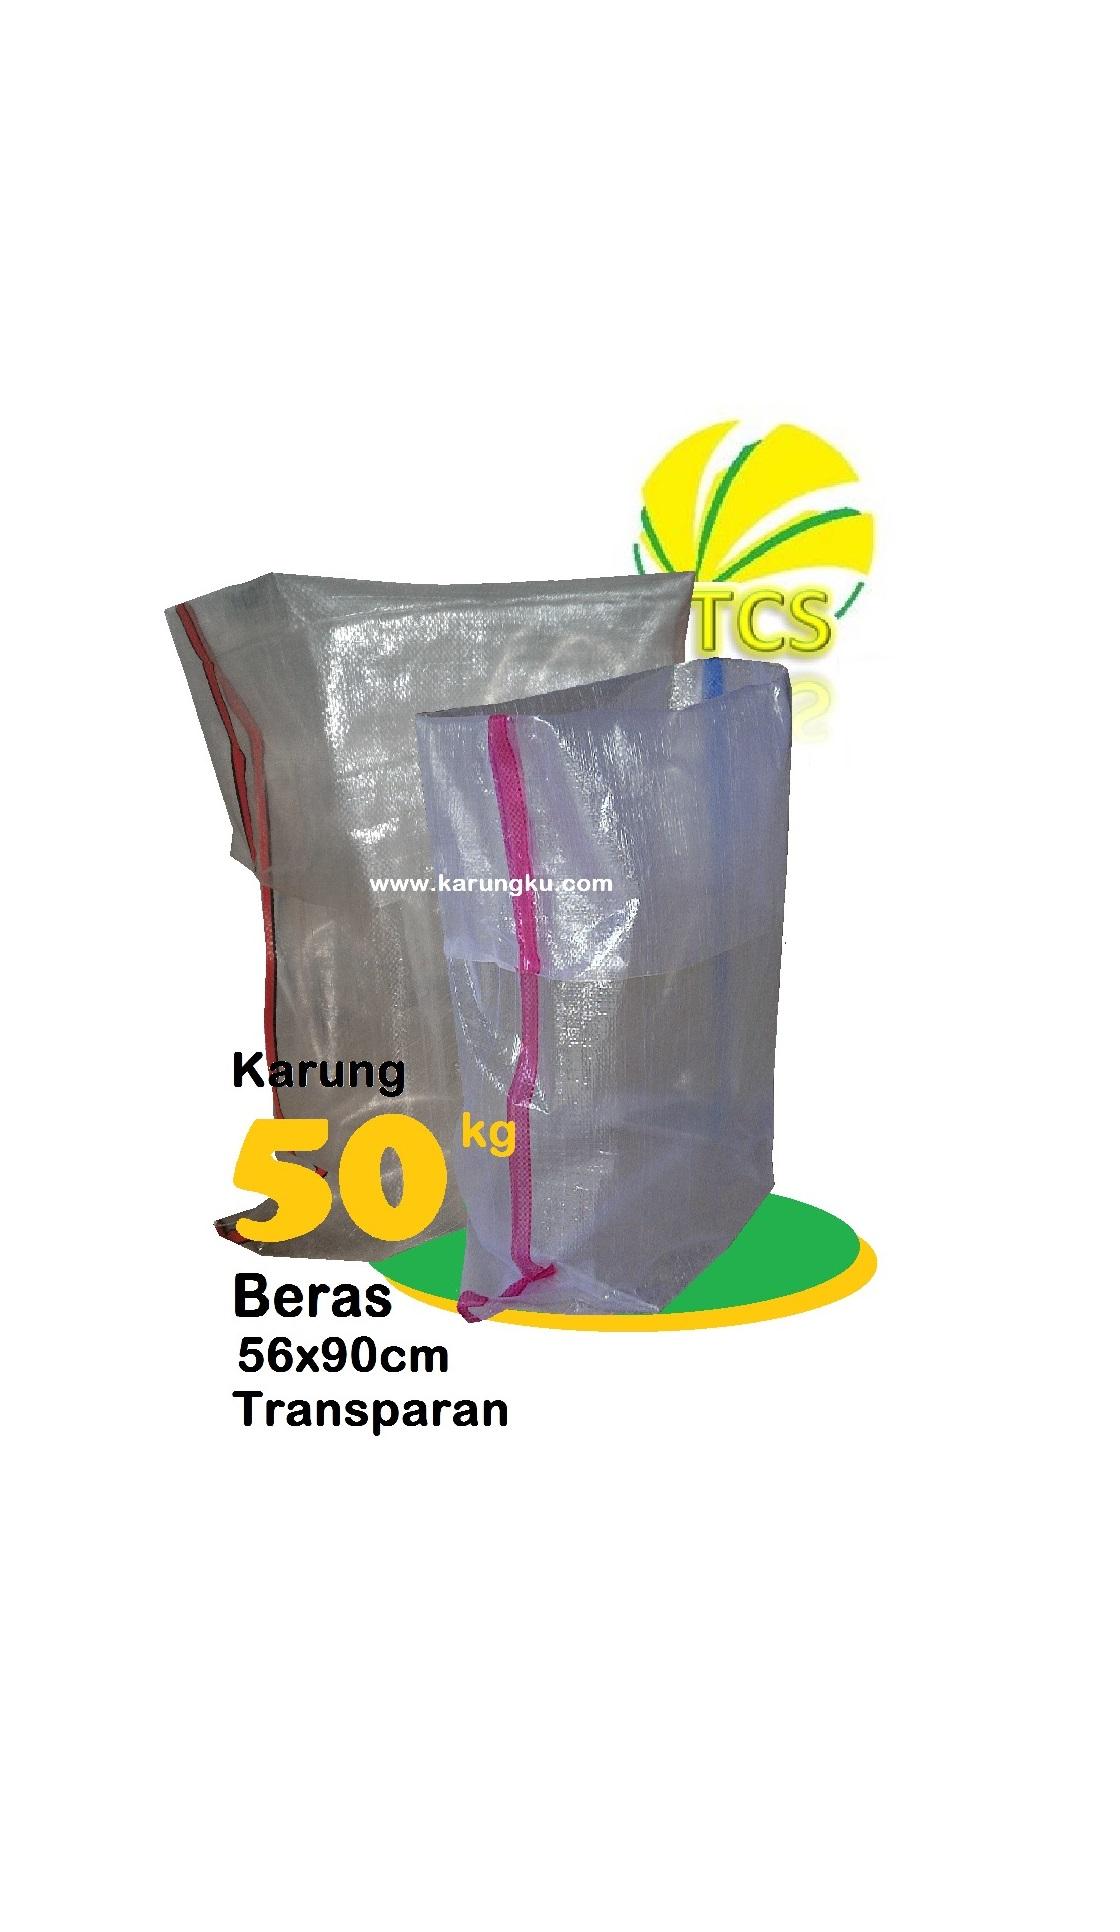 You are currently viewing Karung Plastik Transparan 56x90cm (50kg)